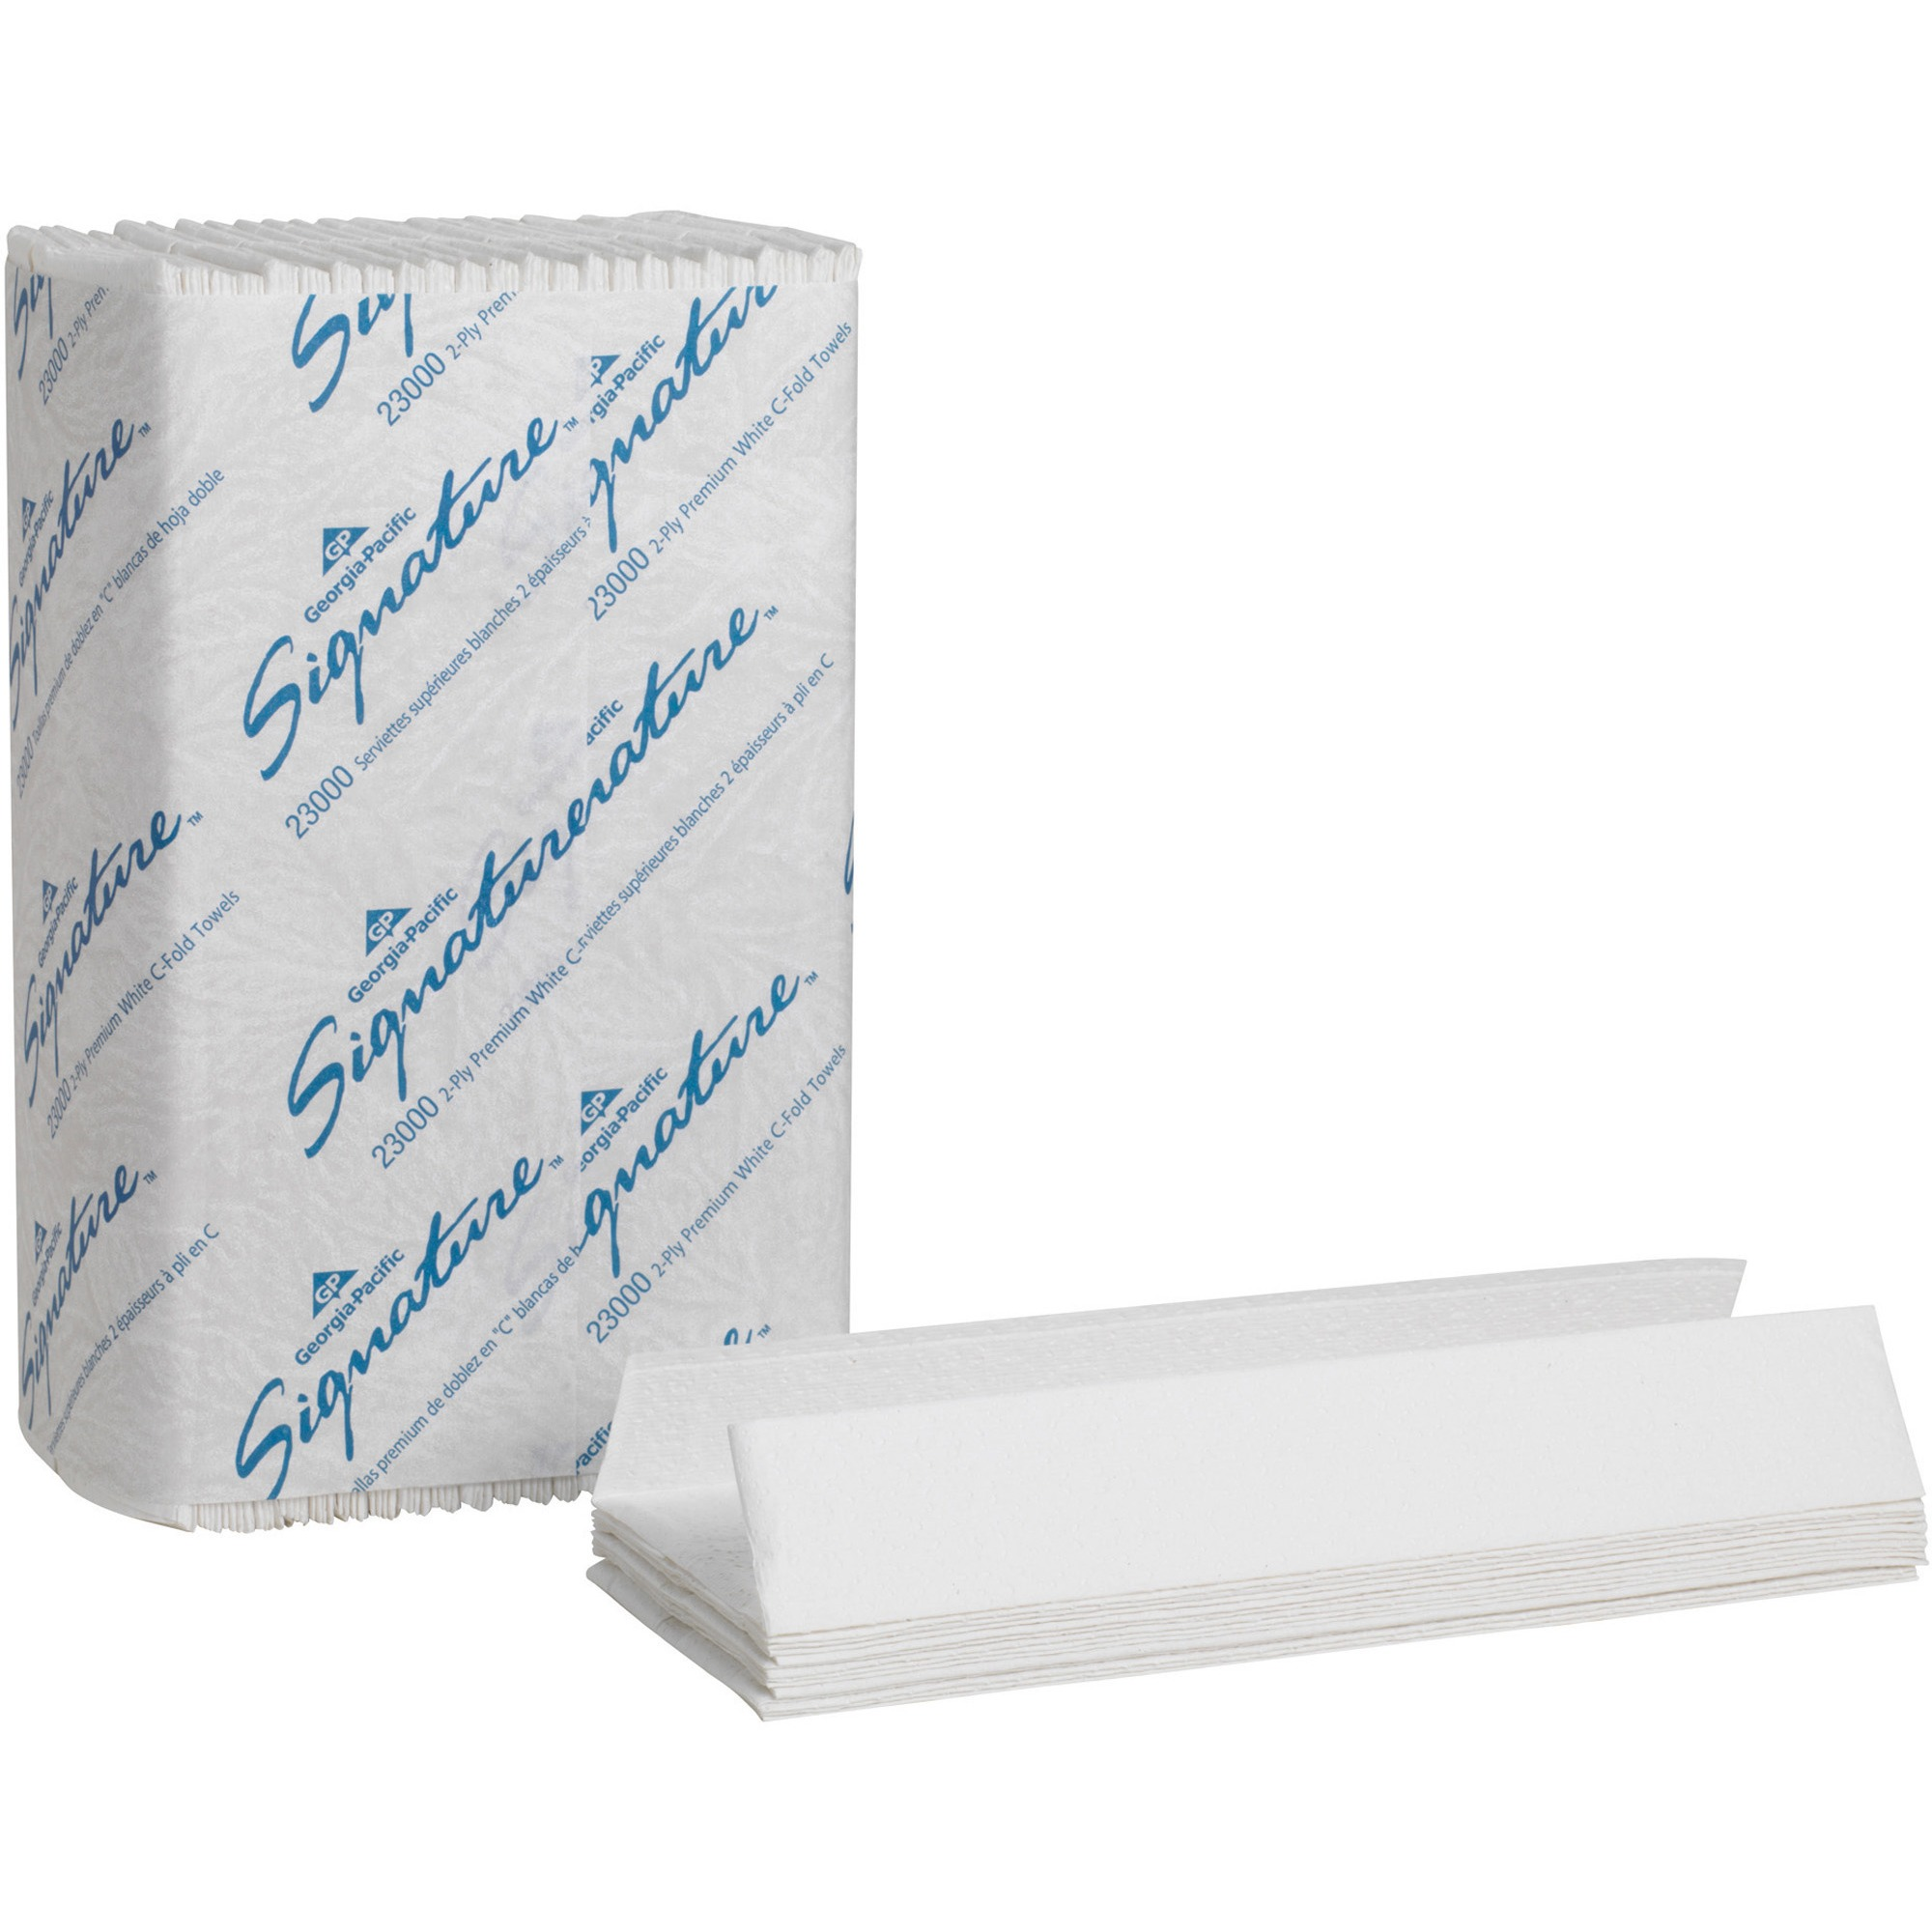 Georgia-Pacific Signature White 2-Ply Premium C-Fold Paper Towels, 23000, 12 Packs of 120 Towels per Case